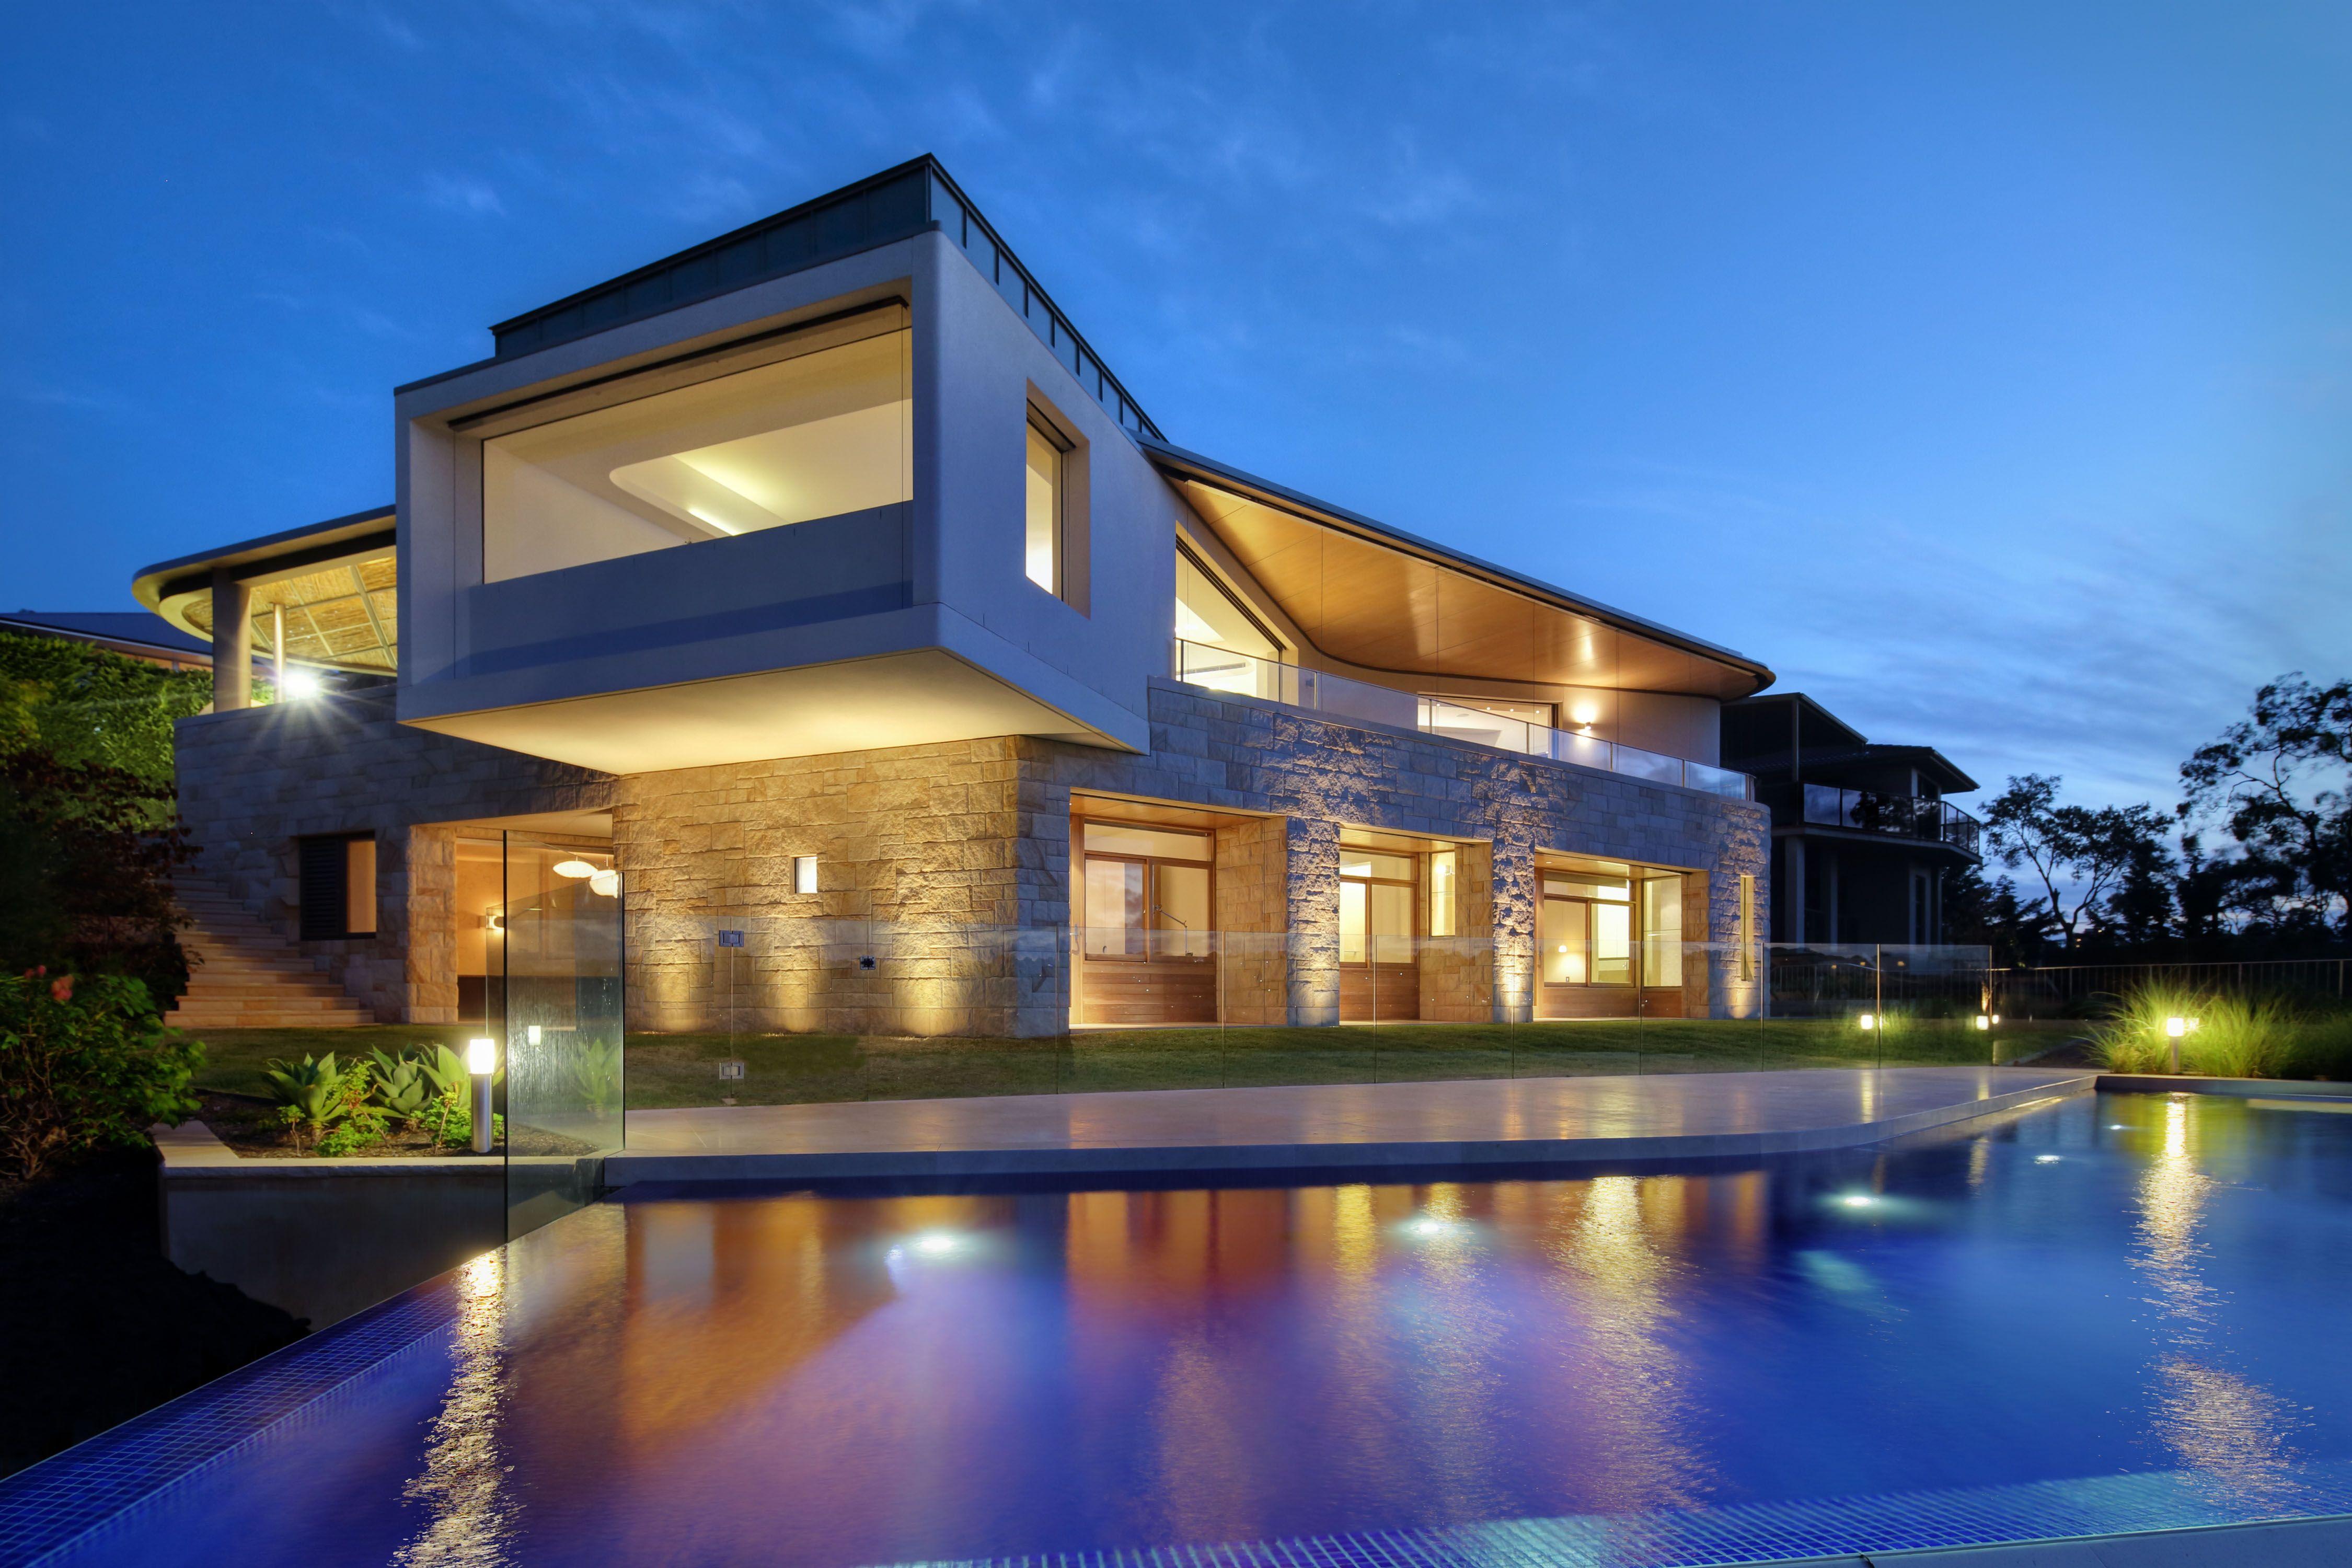 Architecture Houses house in the hamptons ○ - buscar con google | mi casa | pinterest